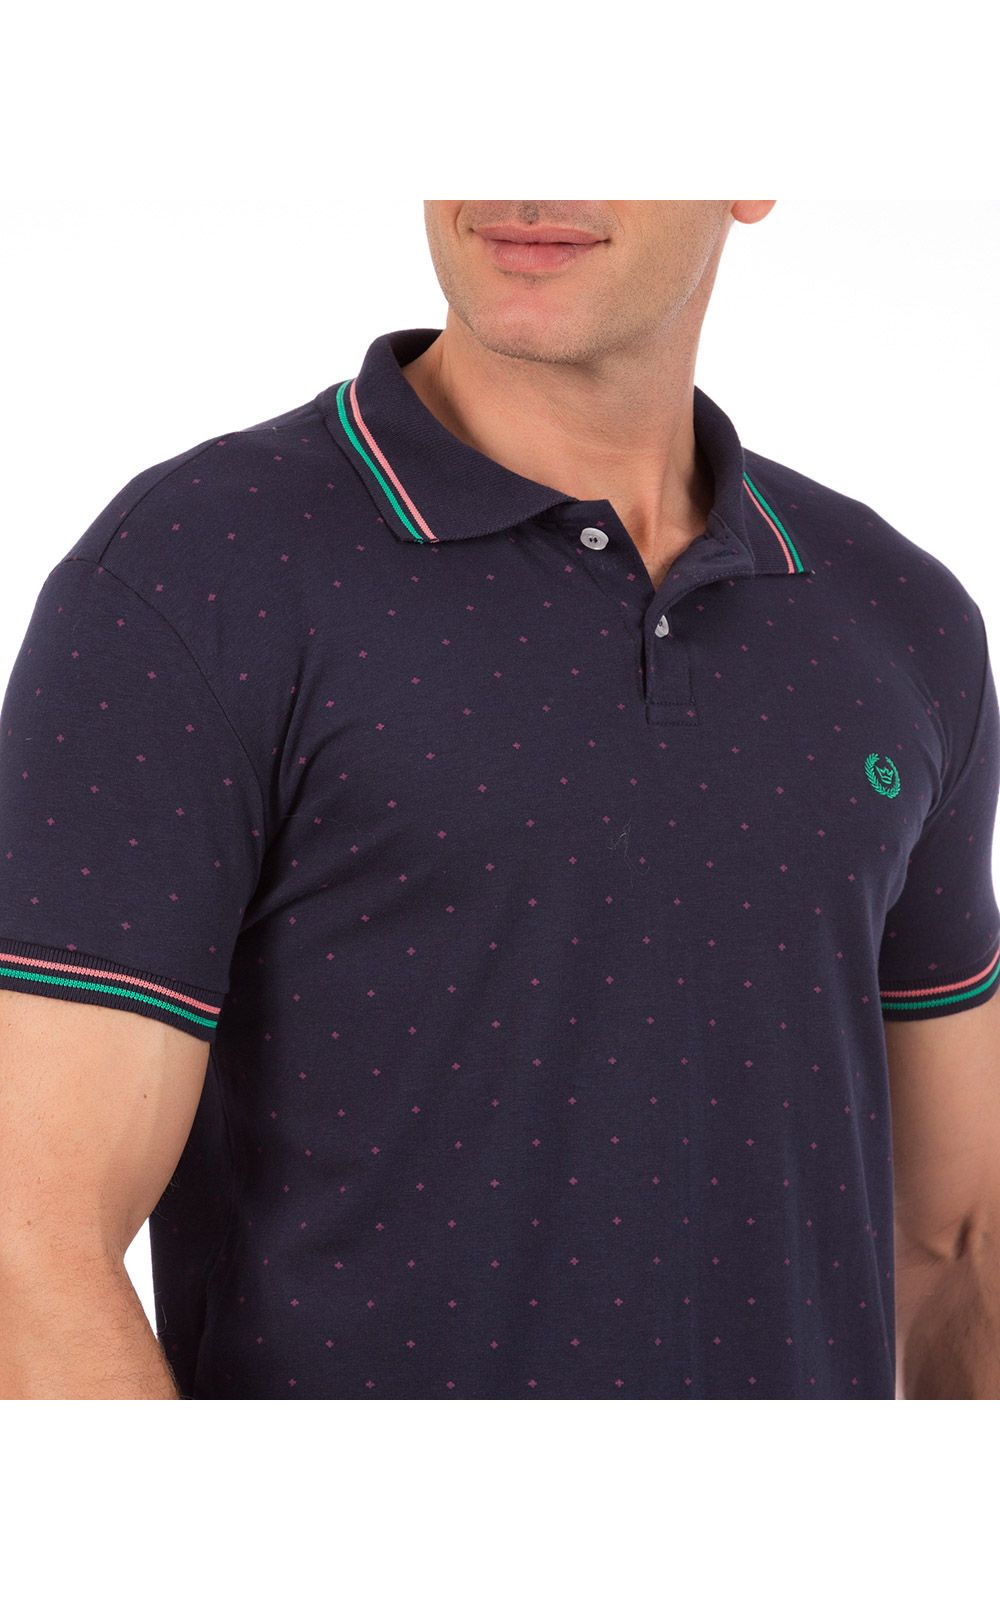 Foto 3 - Camisa Polo Masculina Azul Marinho Estampada